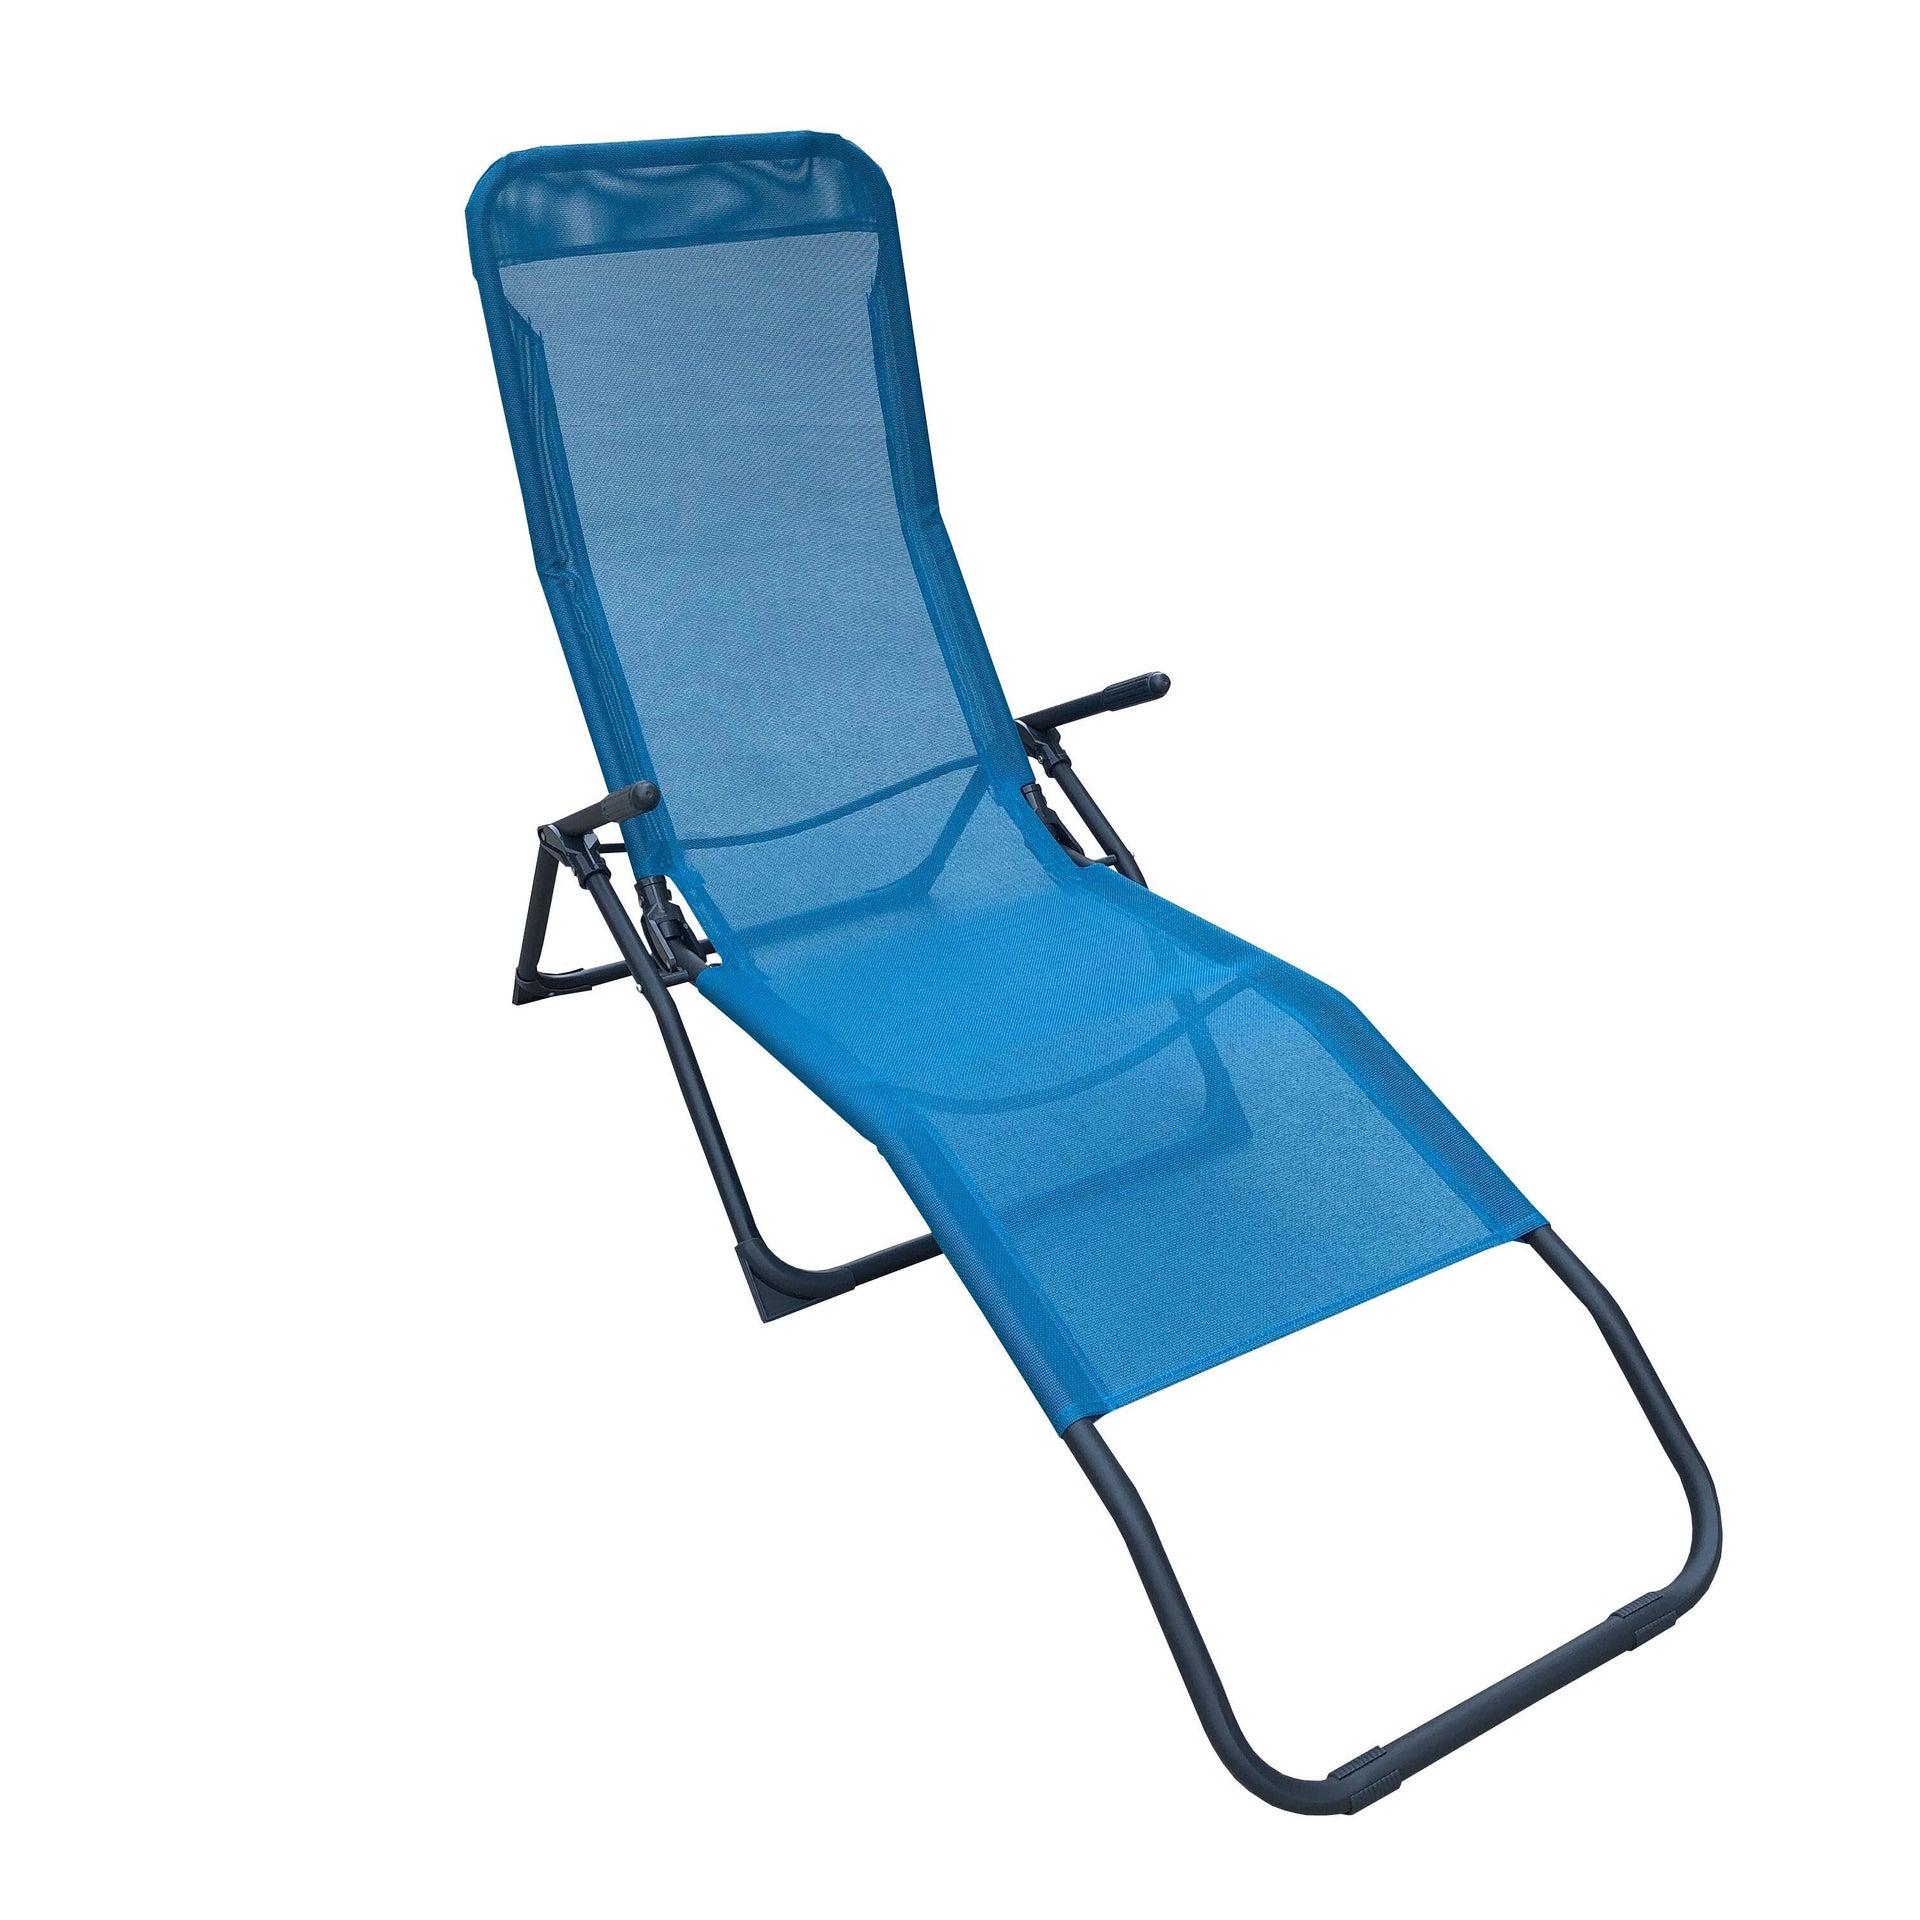 Lettino senza cuscino Fiesta in acciaio blu - 1